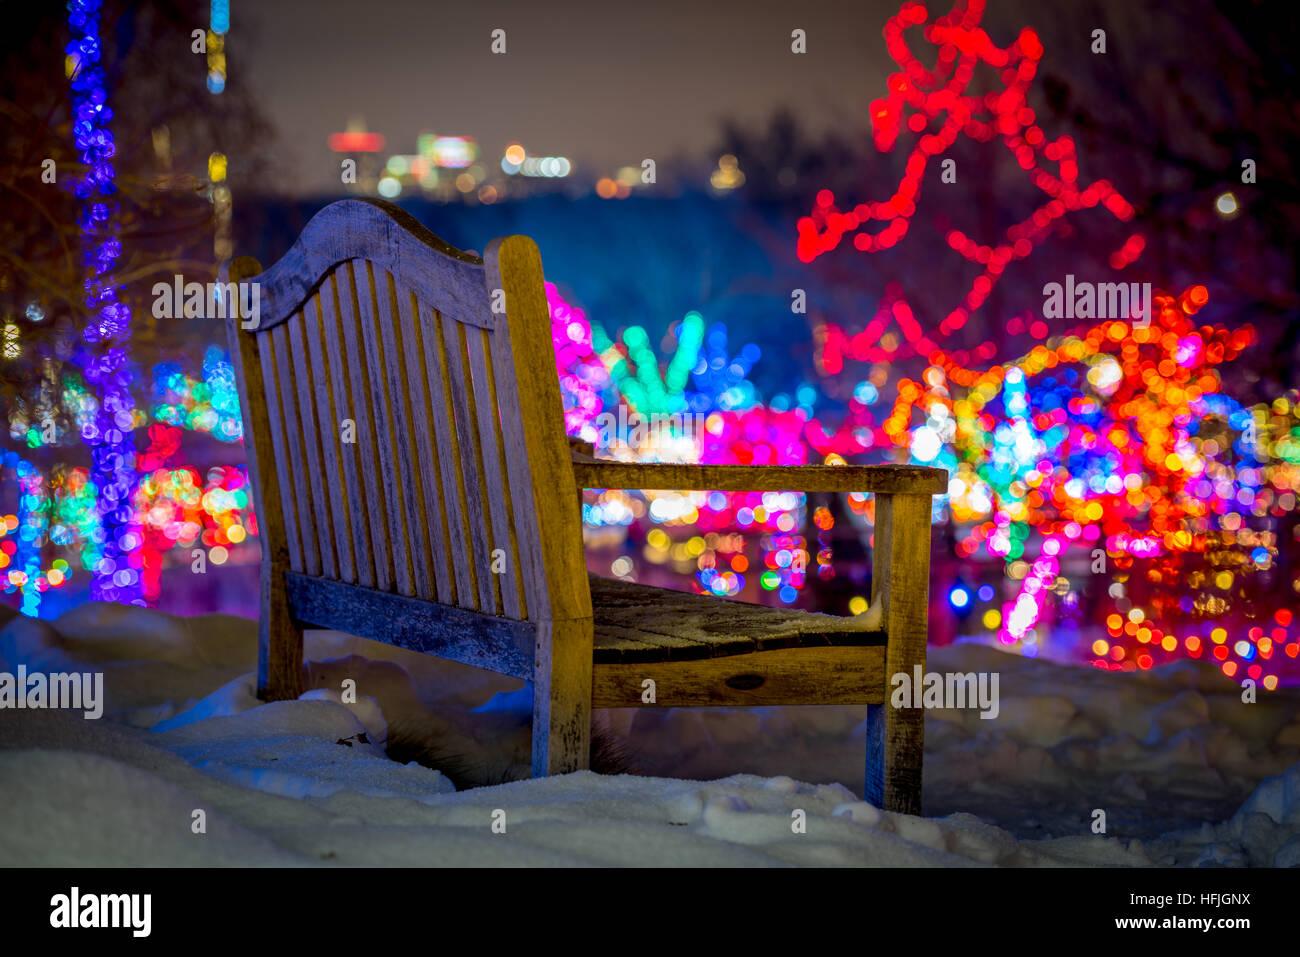 Christmas Lights Boise.Boise Christmas Stock Photos Boise Christmas Stock Images